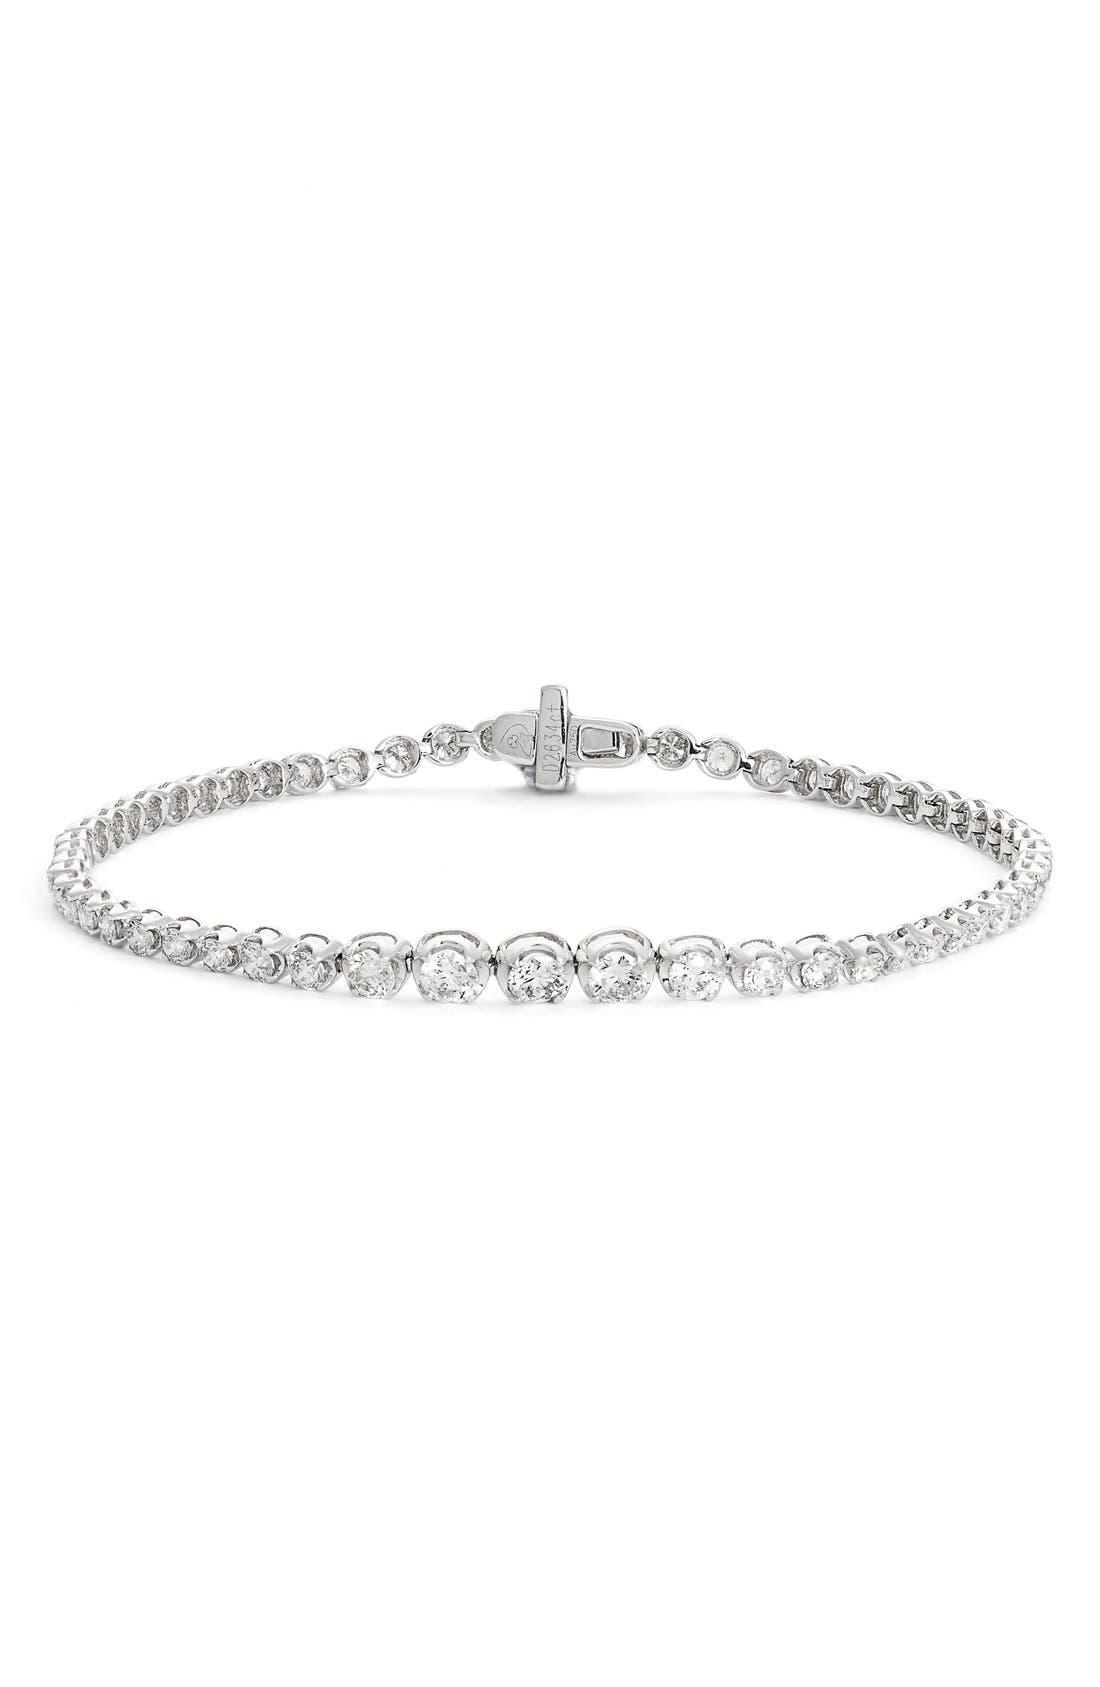 Main Image - Bony Levy Liora Diamond Tennis Bracelet (Nordstrom Exclusive)